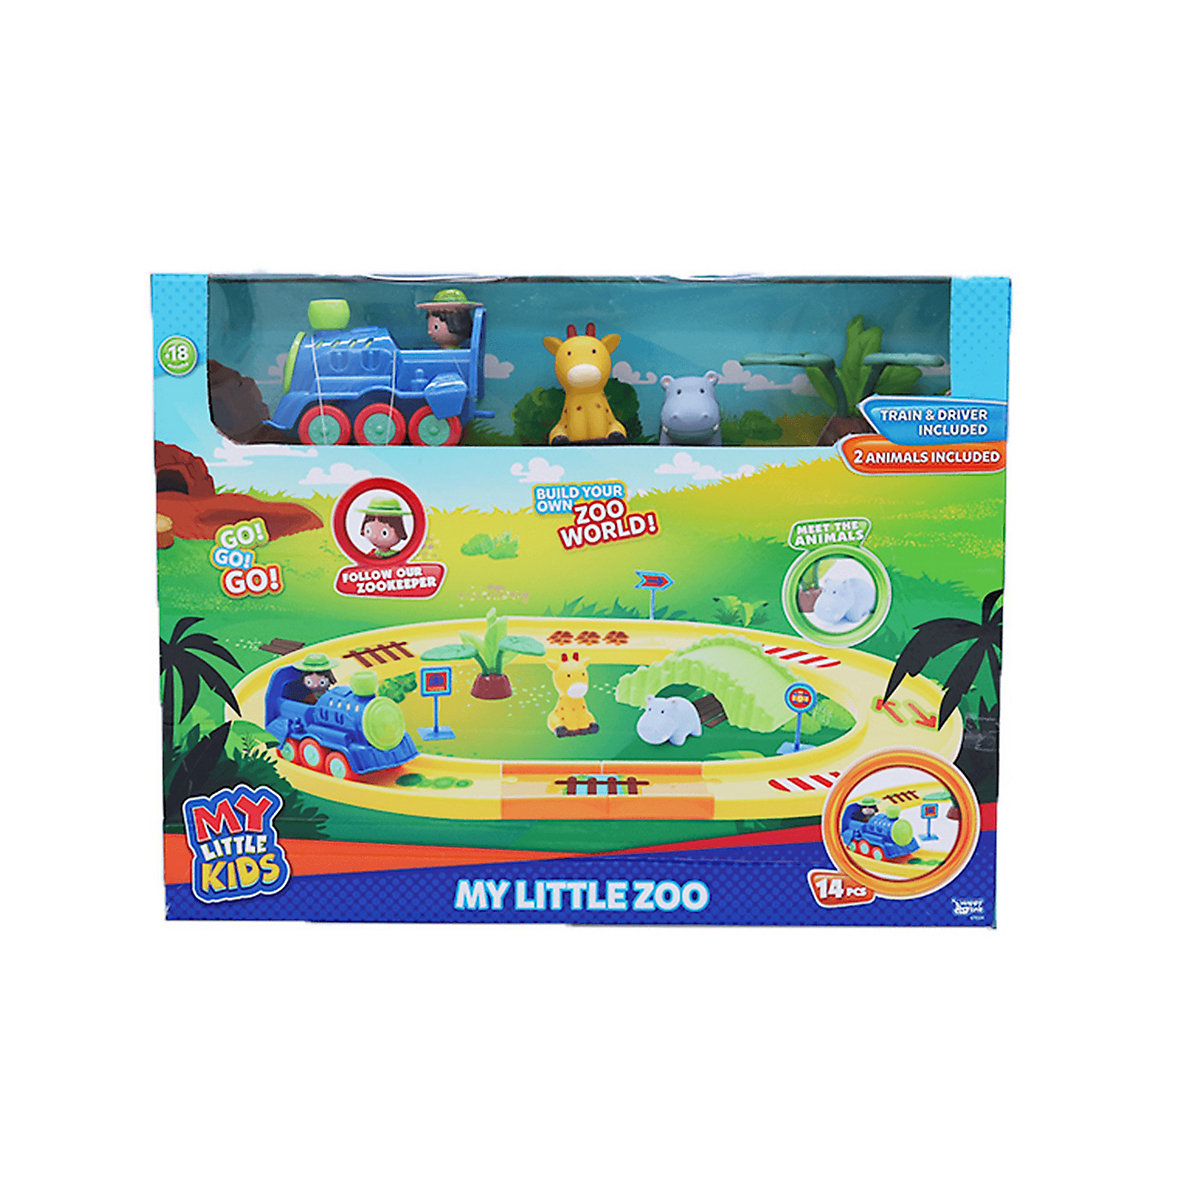 My Little Zoo Train Playset